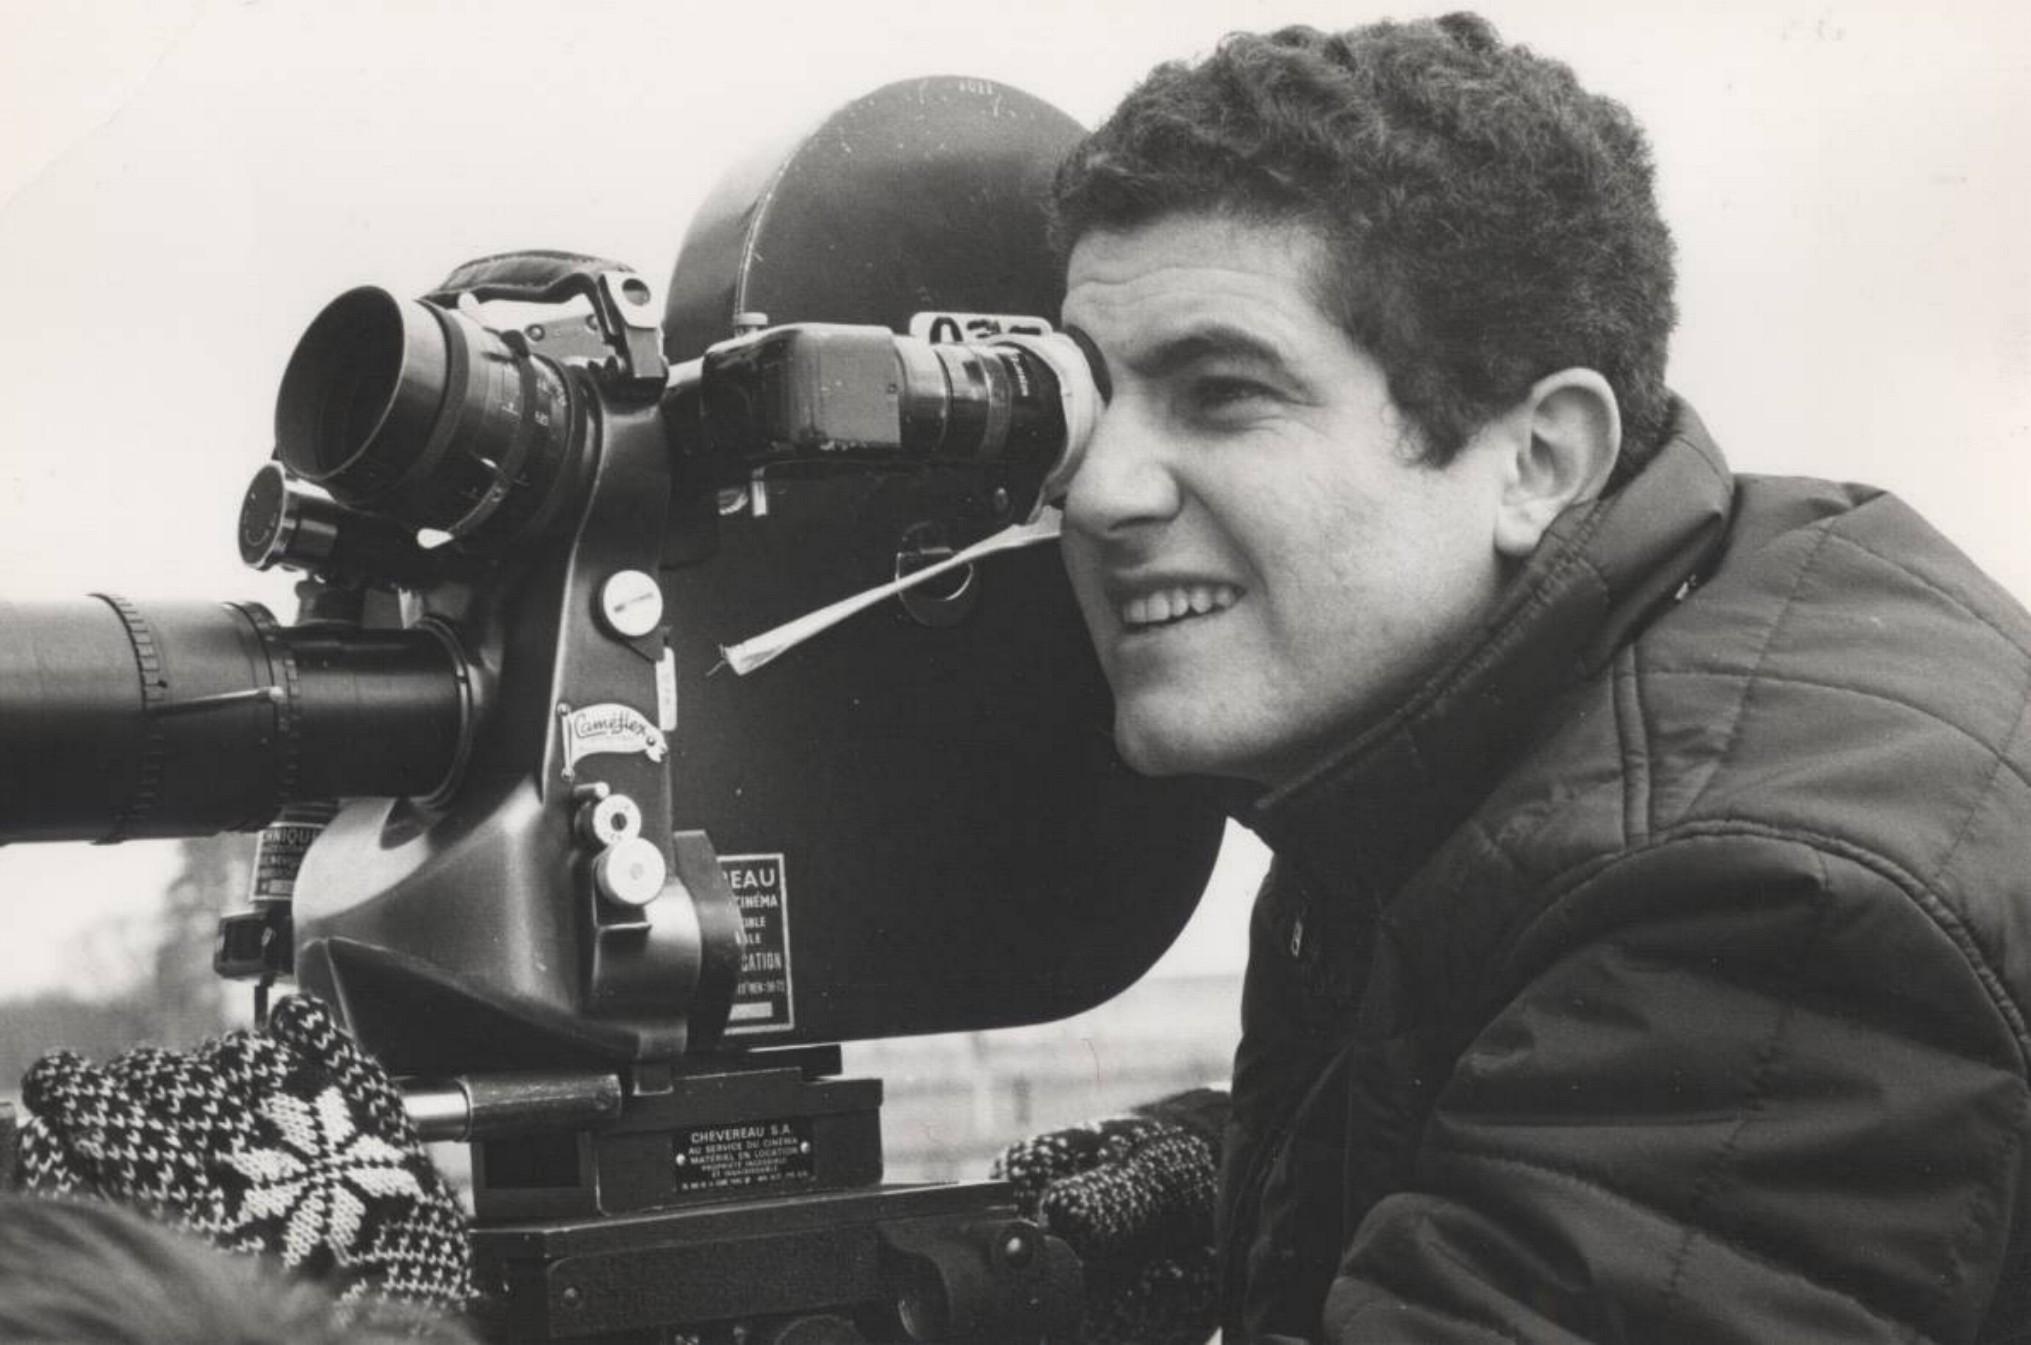 Les Films 13:Claude Lelouch shooting with a Caméflex camera